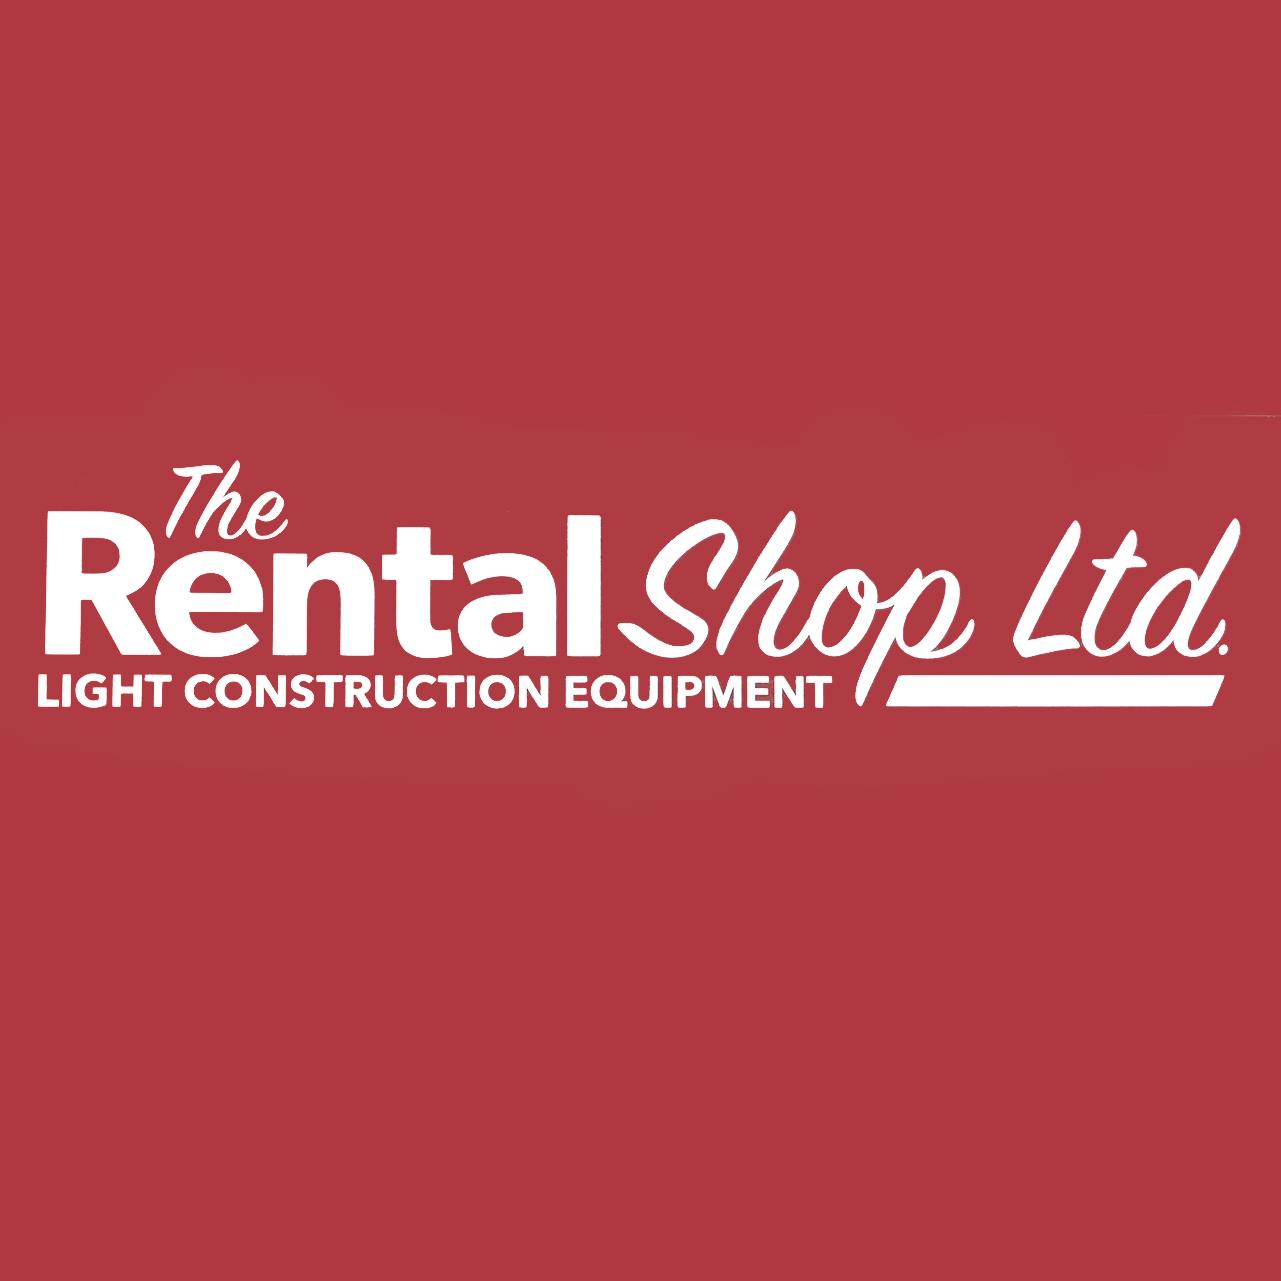 the rental shop.jpg